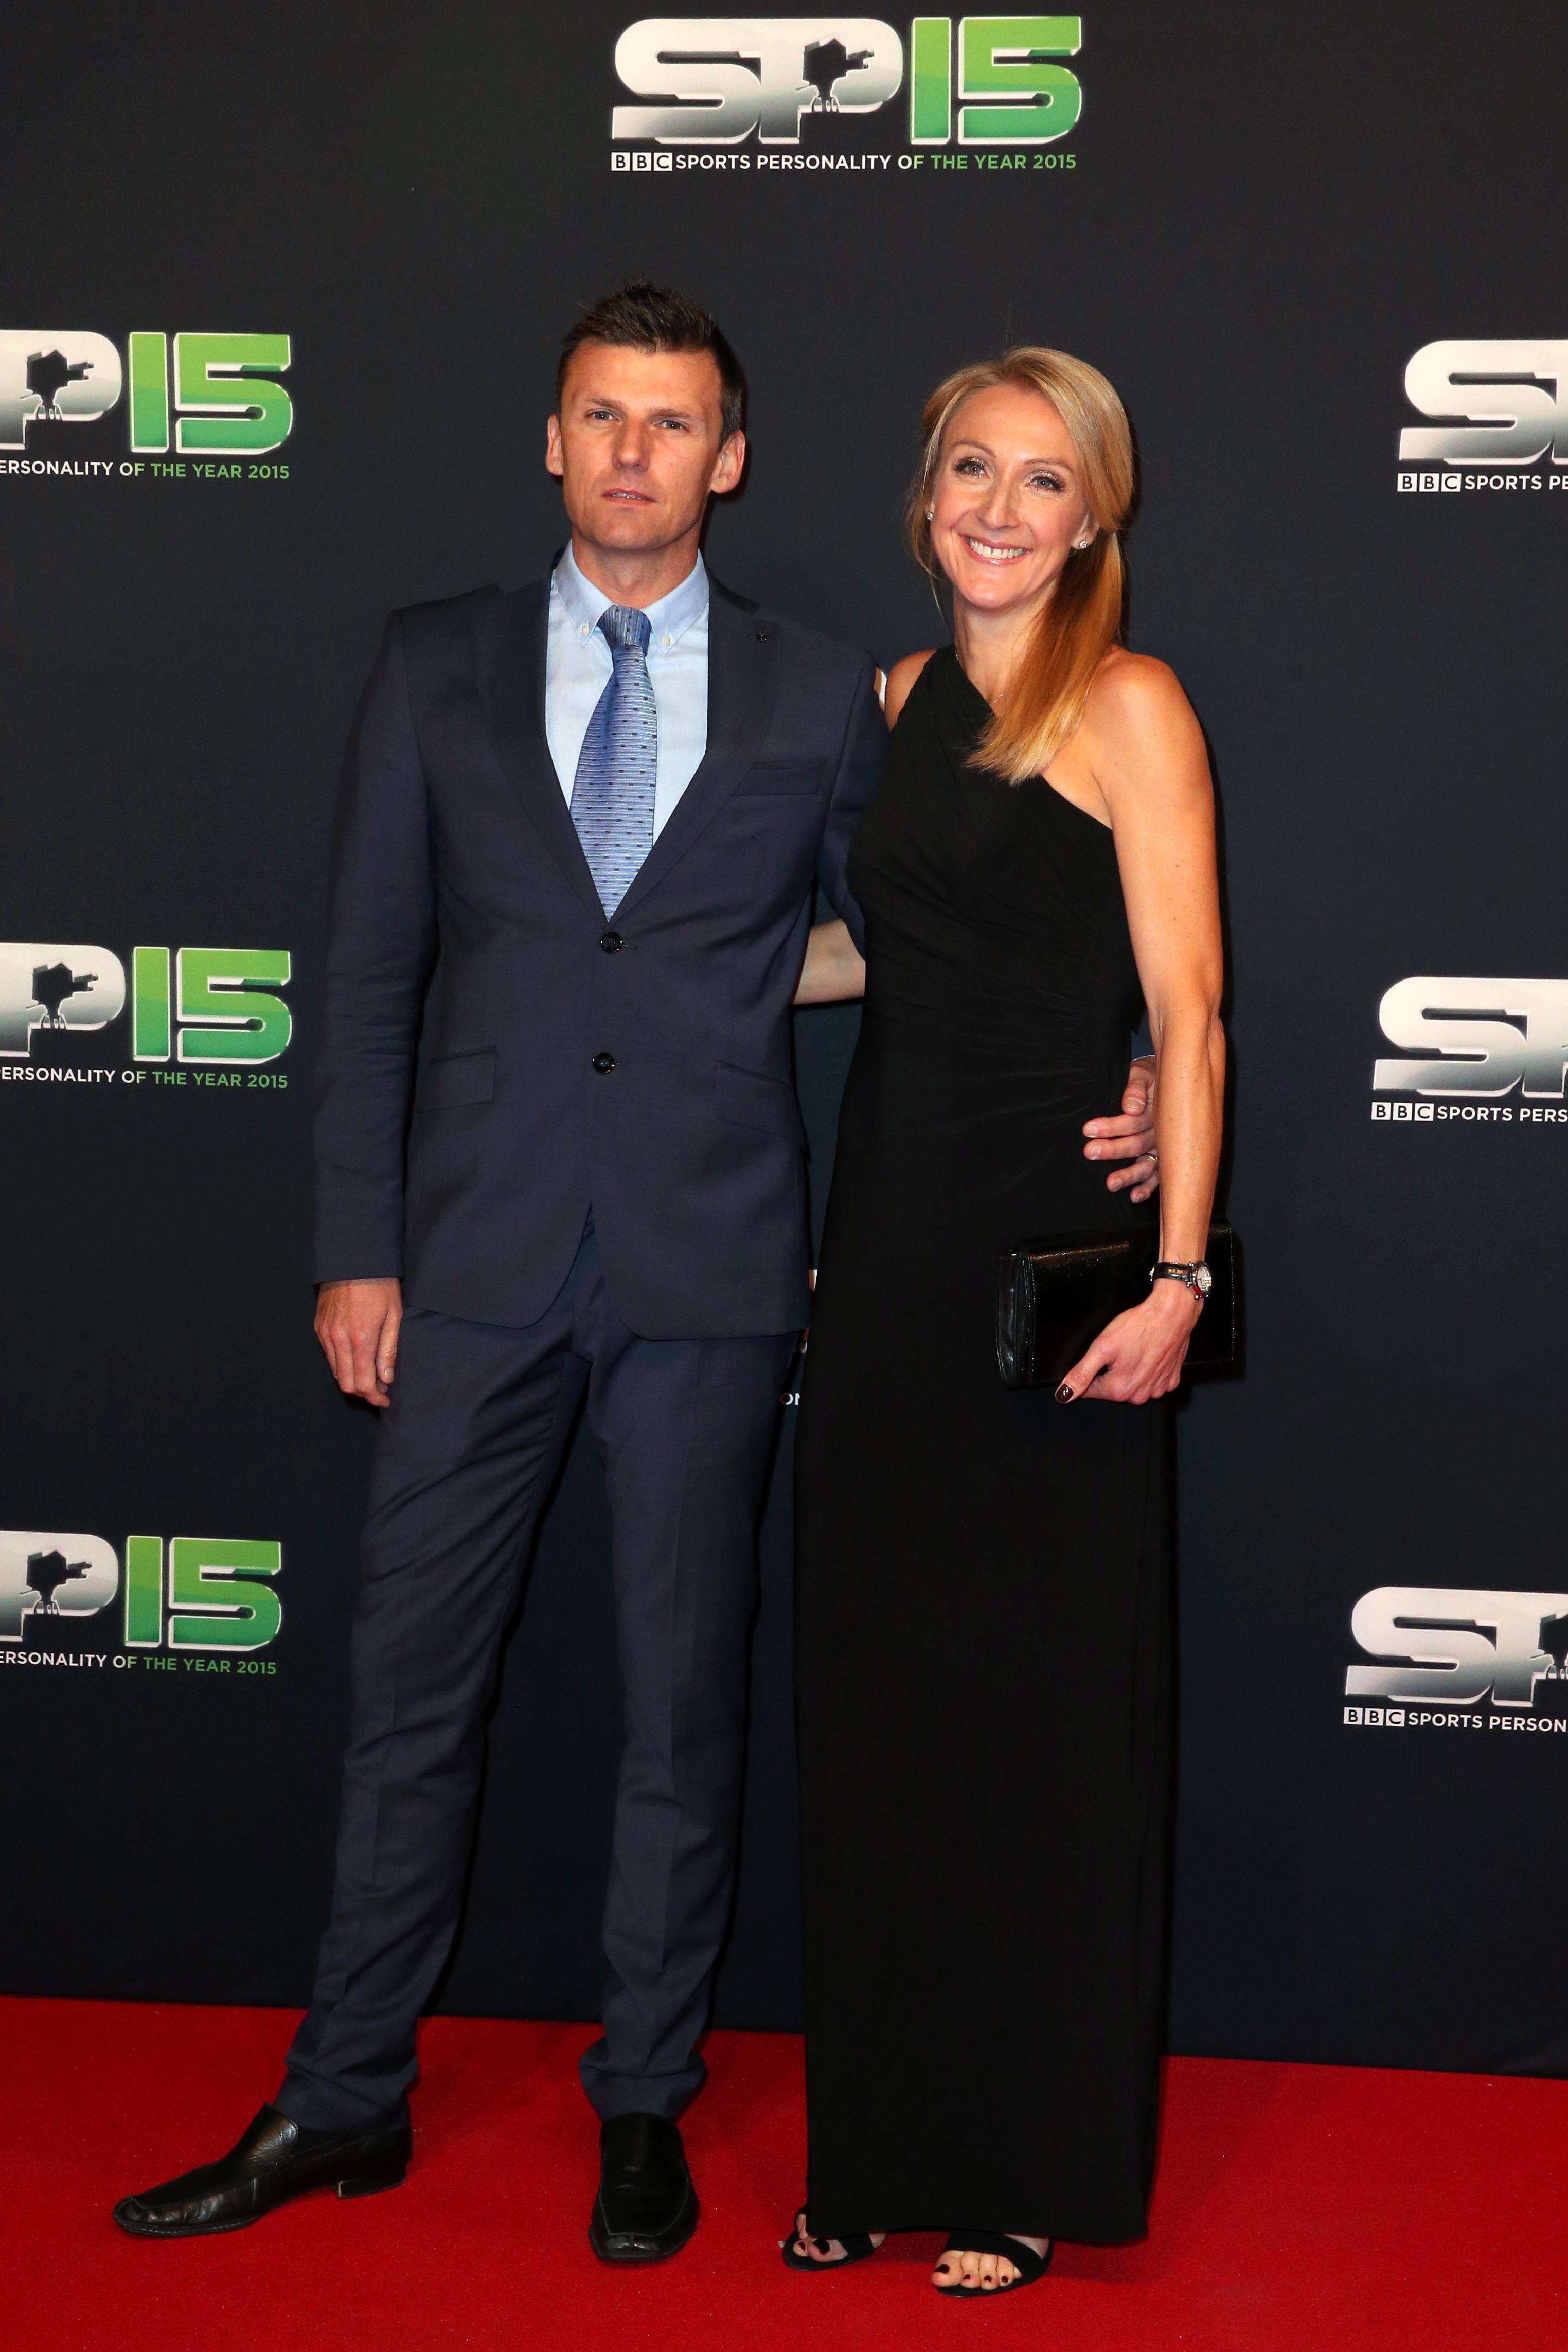 Mo Farah will team up with Paula Radcliffe's husband Gary Lough